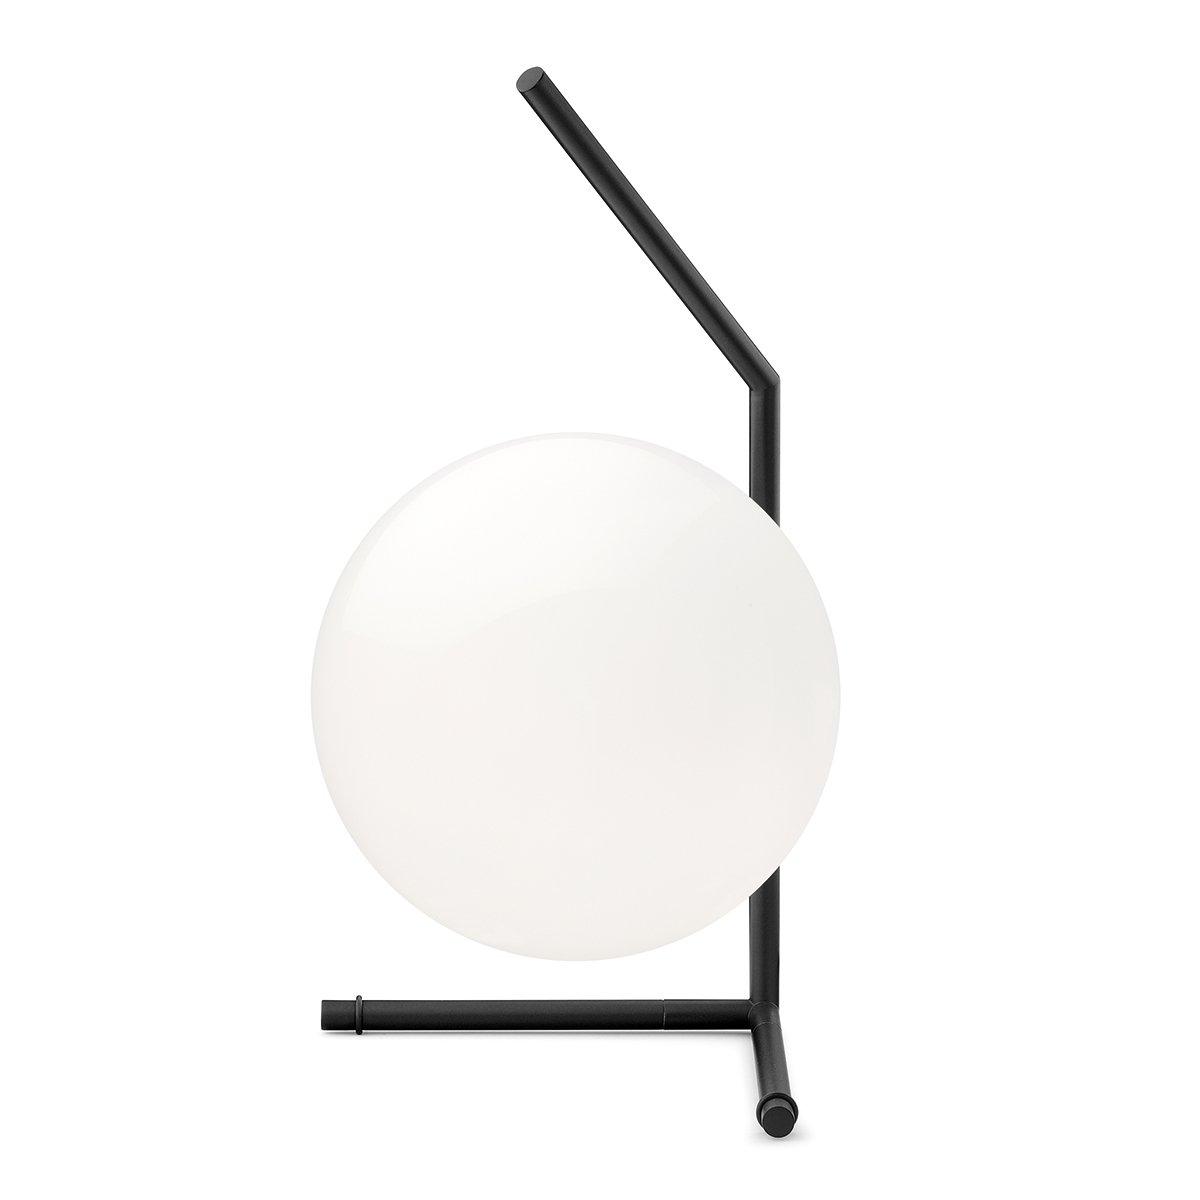 FLOS IC T1 Tafellamp, laag - Zwart